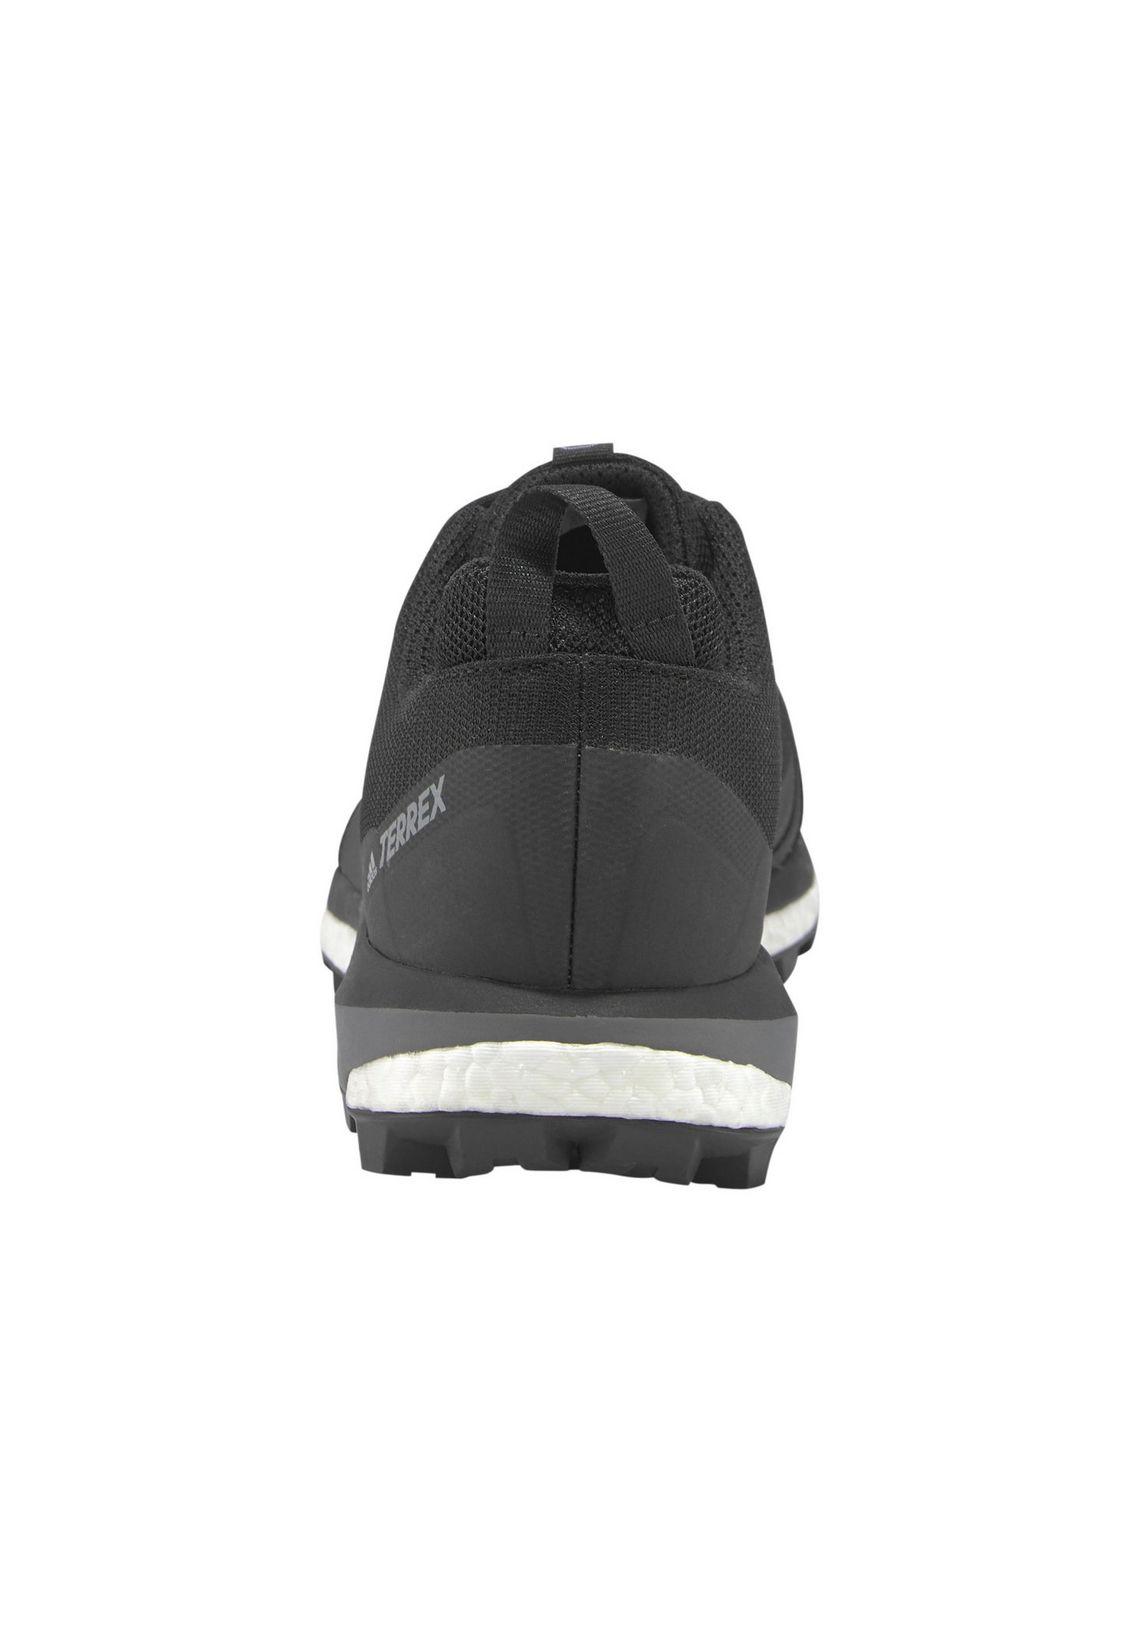 adidas Performance outdoorschoenen  Terrex Skychaser LT snel gevonden  zwart